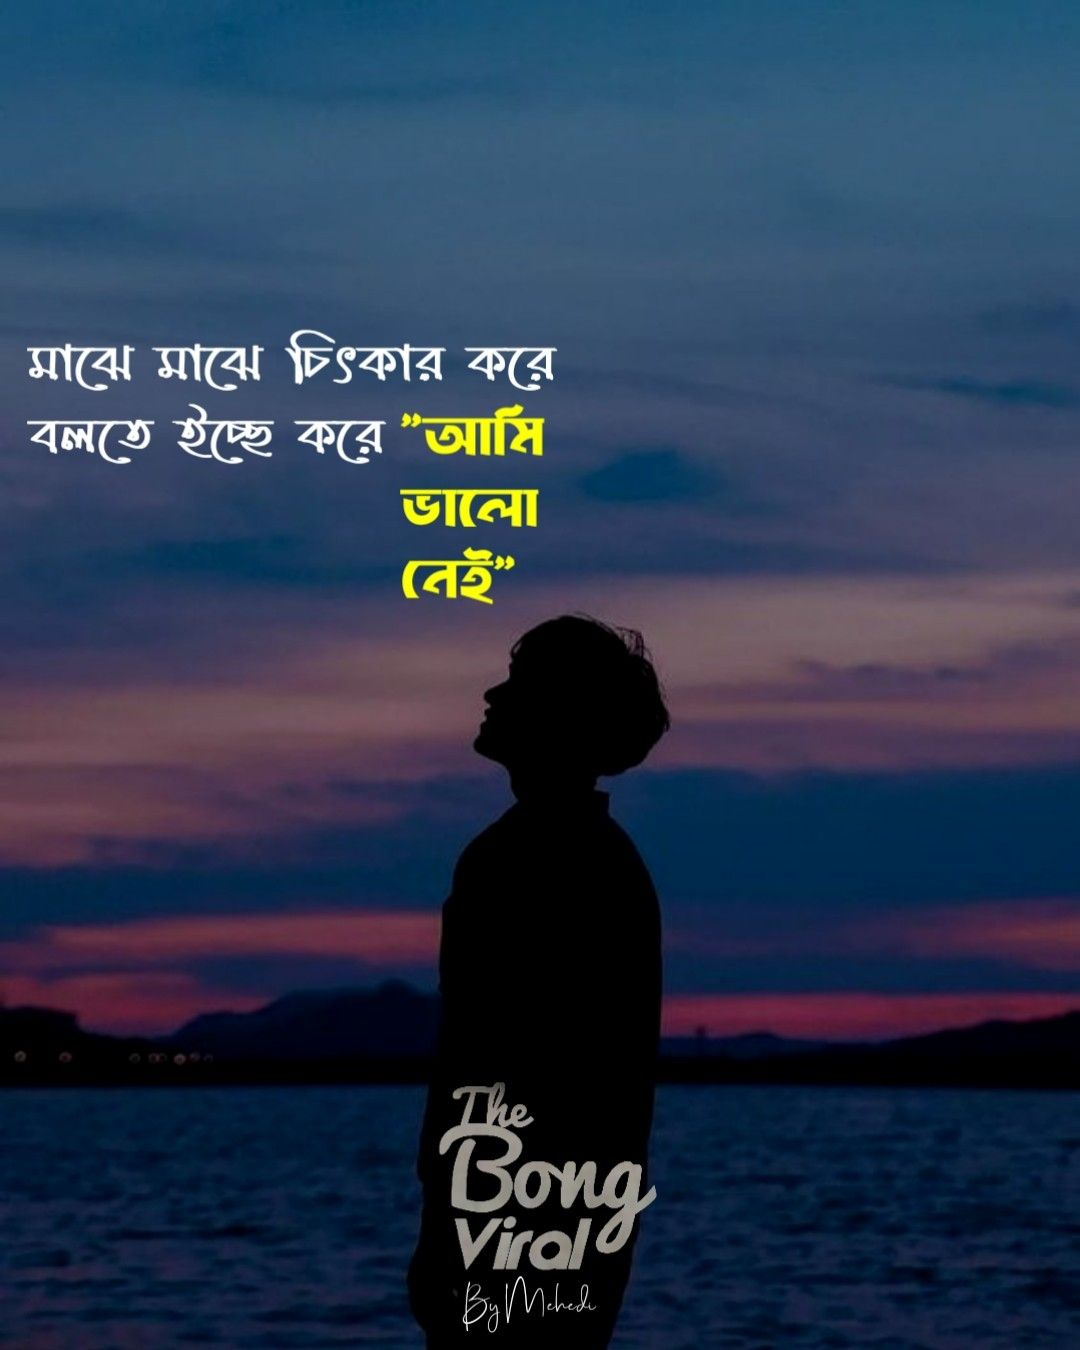 bengali quotes love bengali quotes love life bengali ...